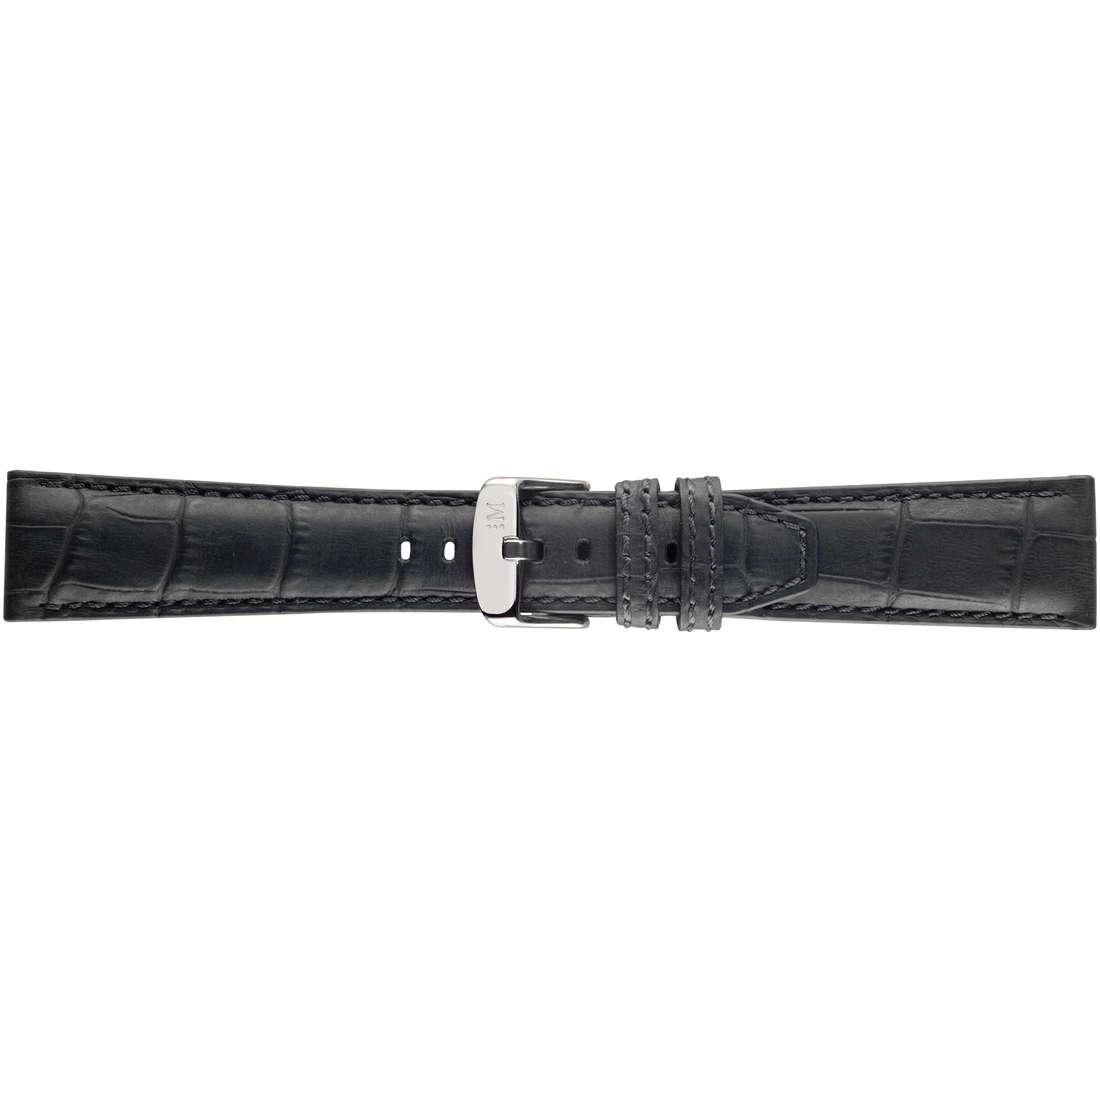 watch watch bands watch straps man Morellato Linea Sport A01X4497B44019CR20